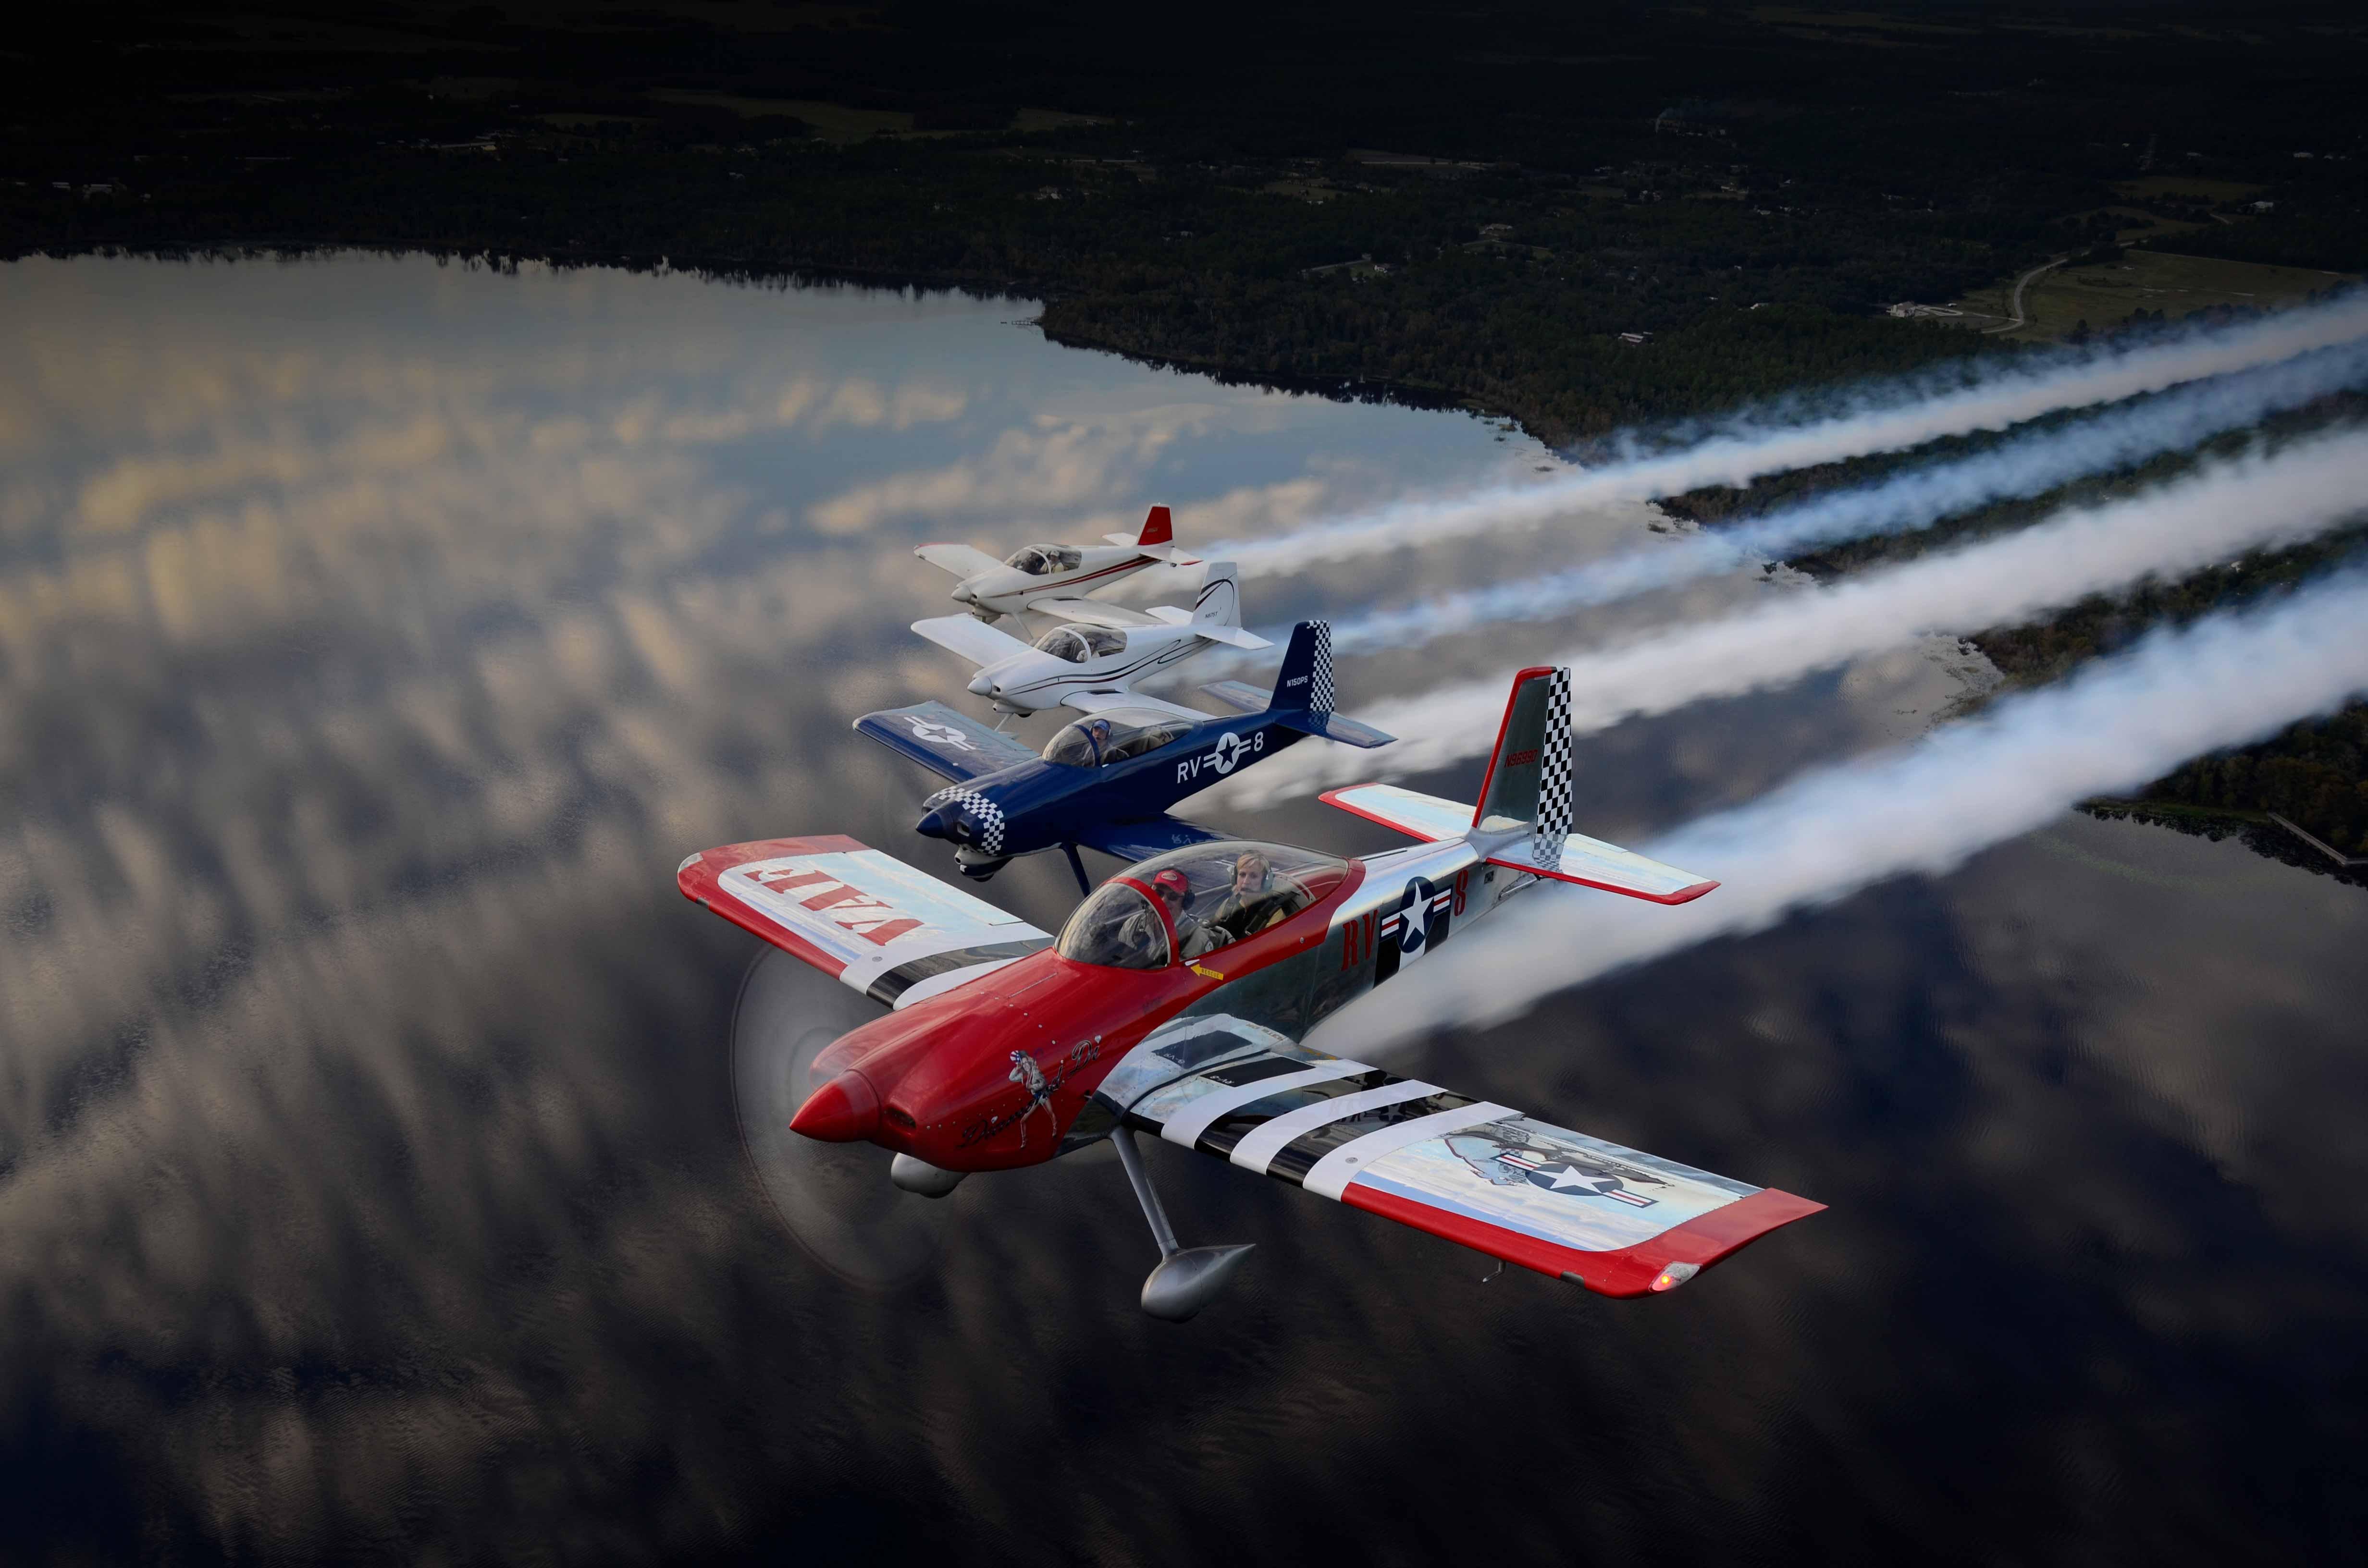 RV-8 / 8A - Van's Aircraft Total Performance RV Kit Planes